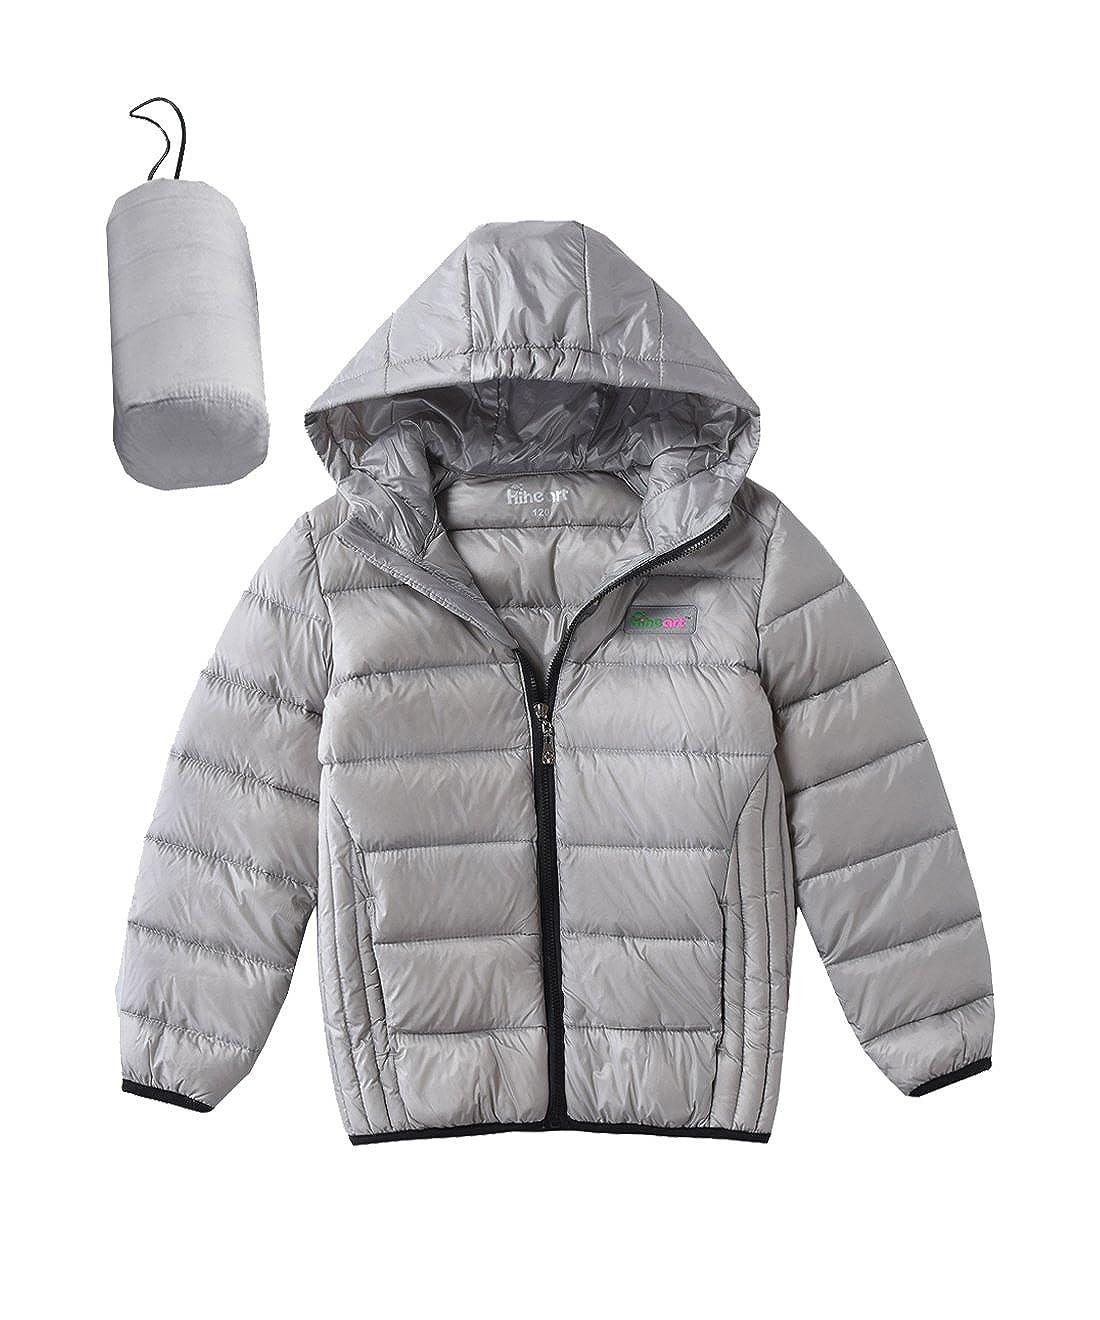 Hiheart Boys Girls Ultralight Hooded Puffer Jacket Winter Down Coat INDN01p